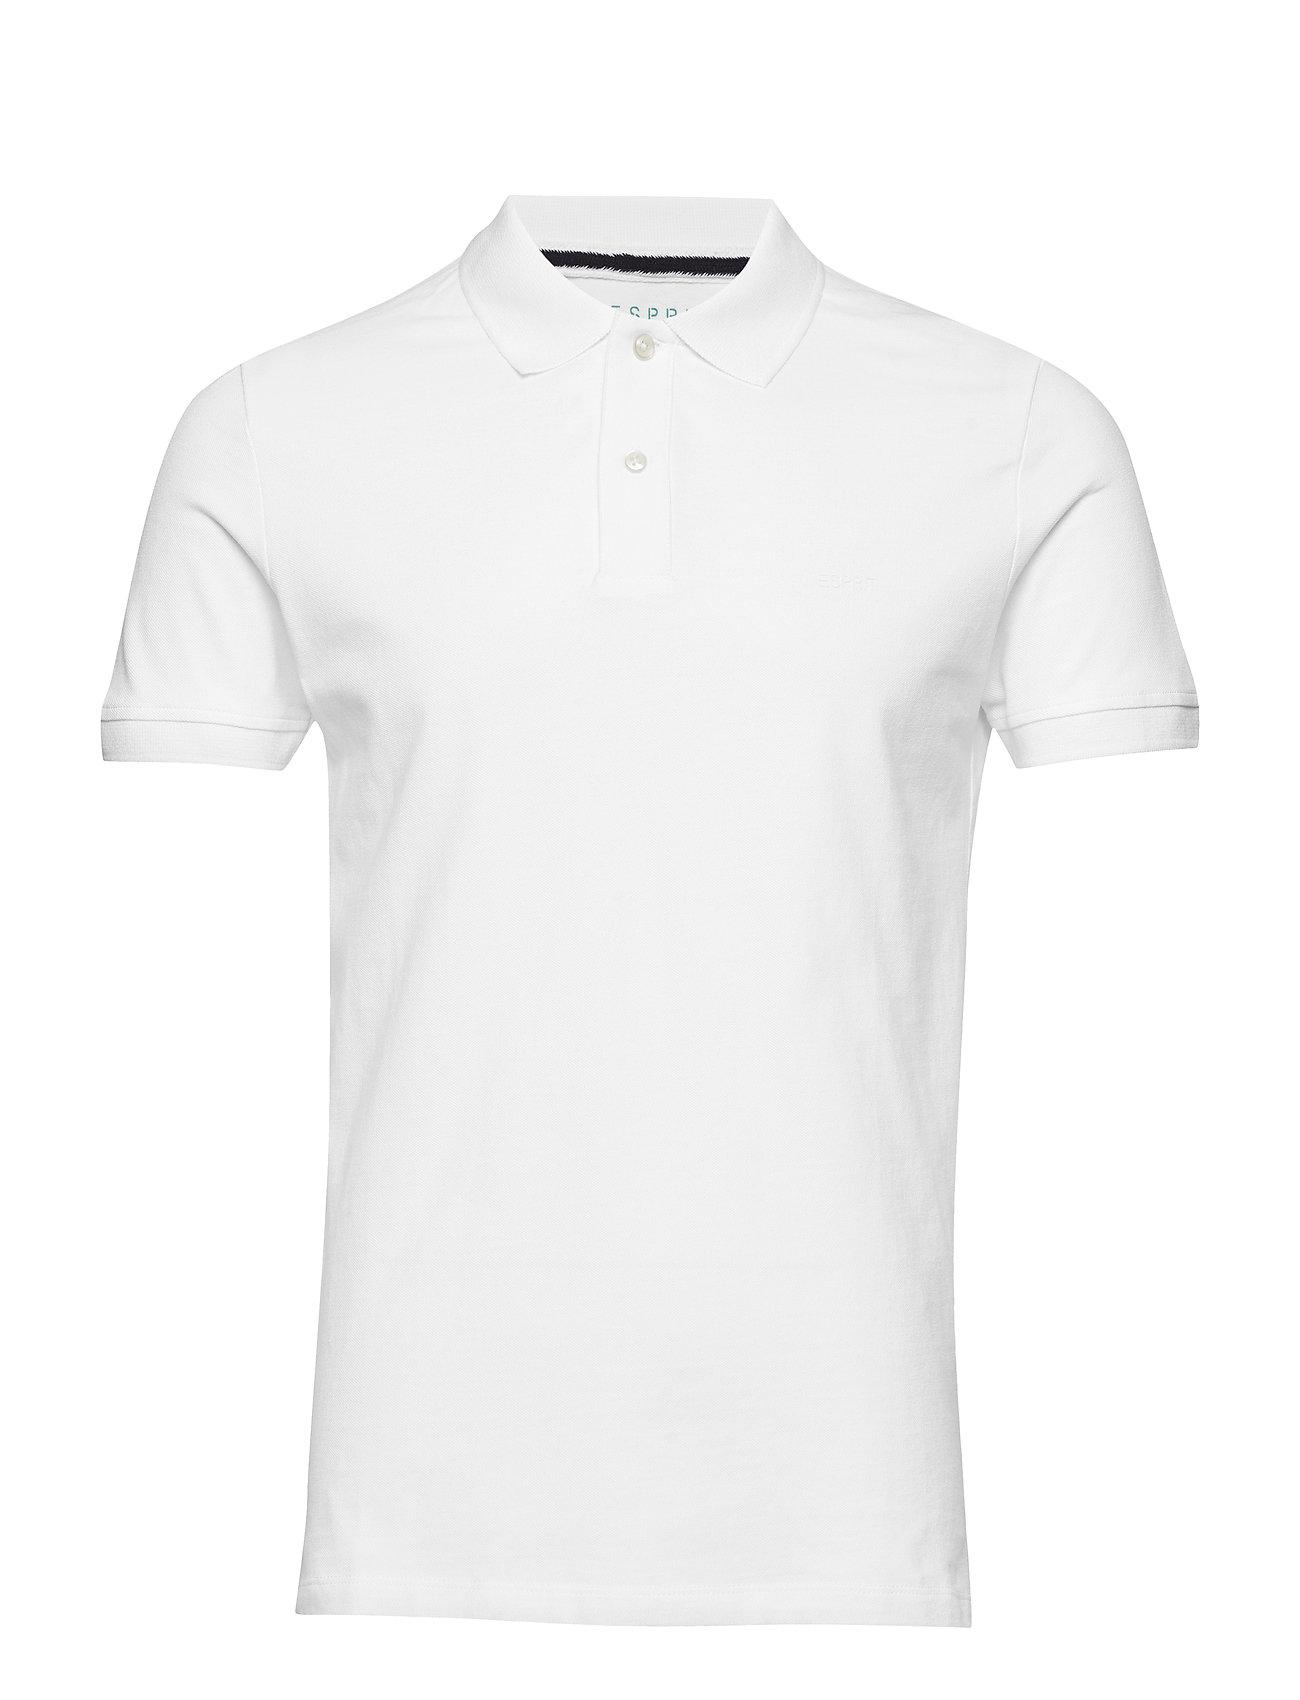 Esprit Casual Polo shirts - WHITE